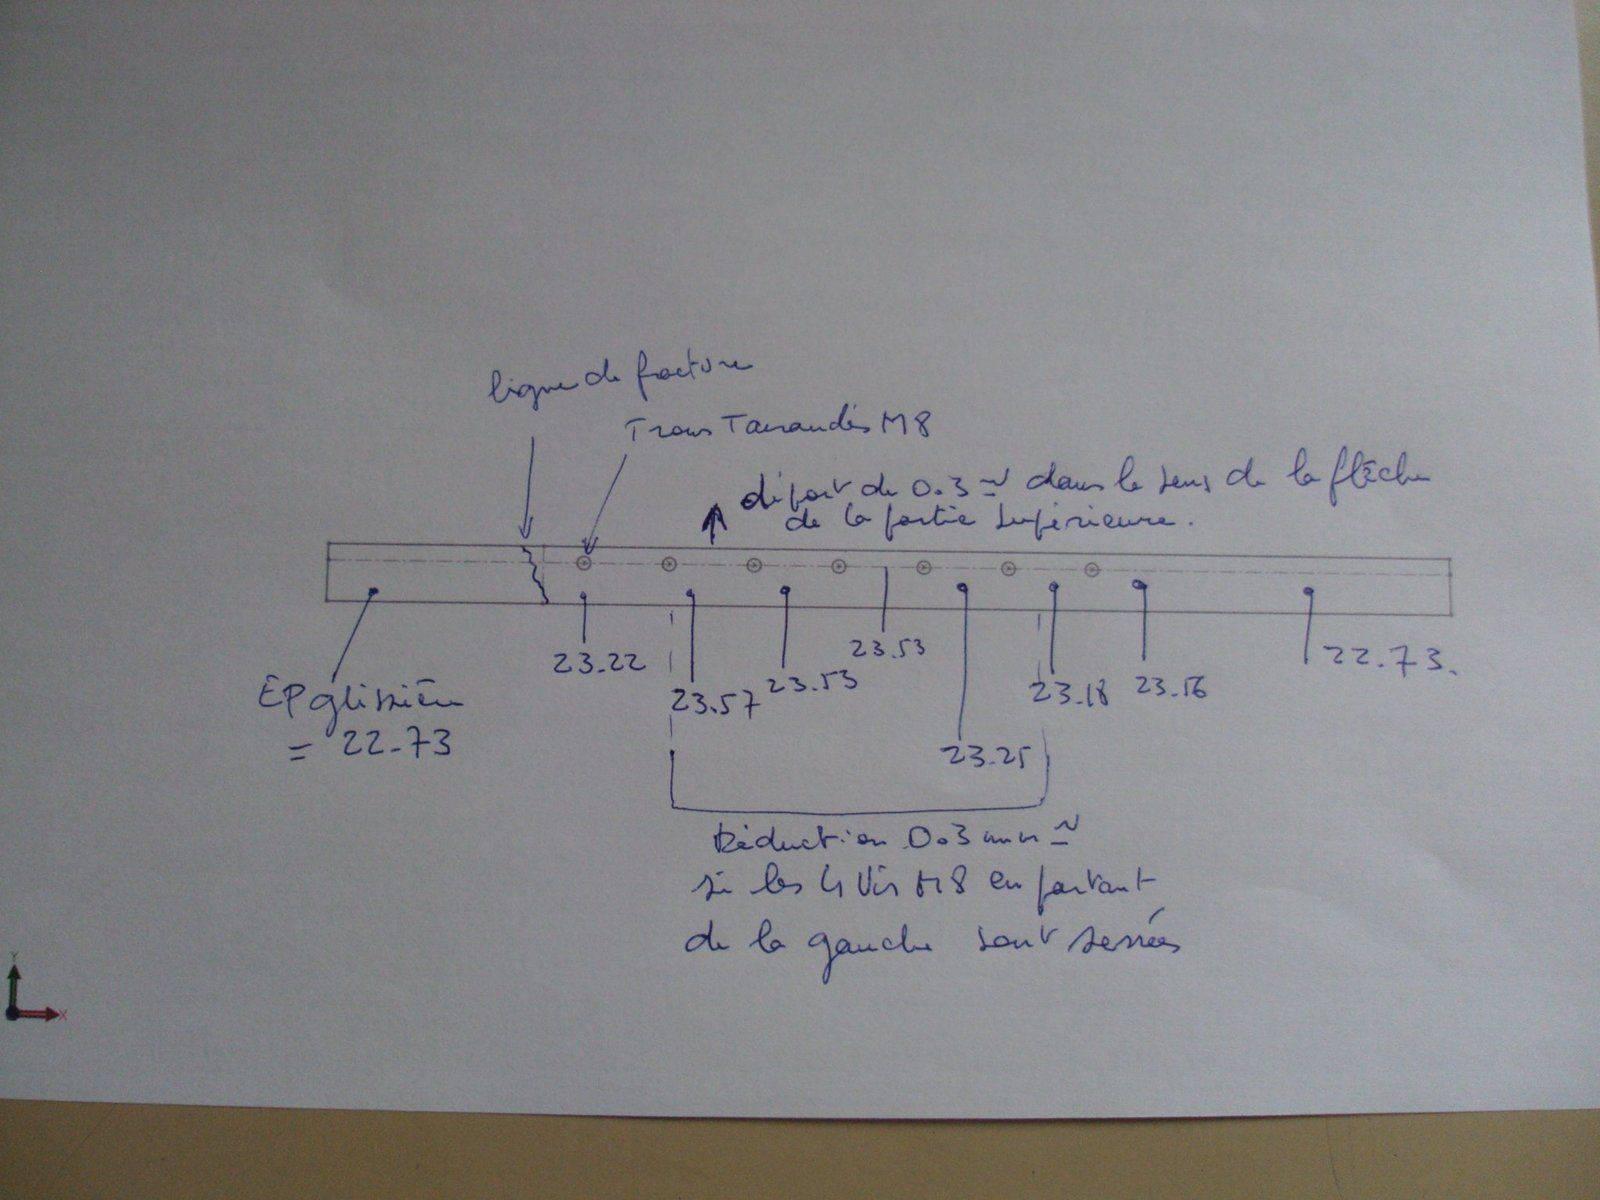 DSC05105.JPG